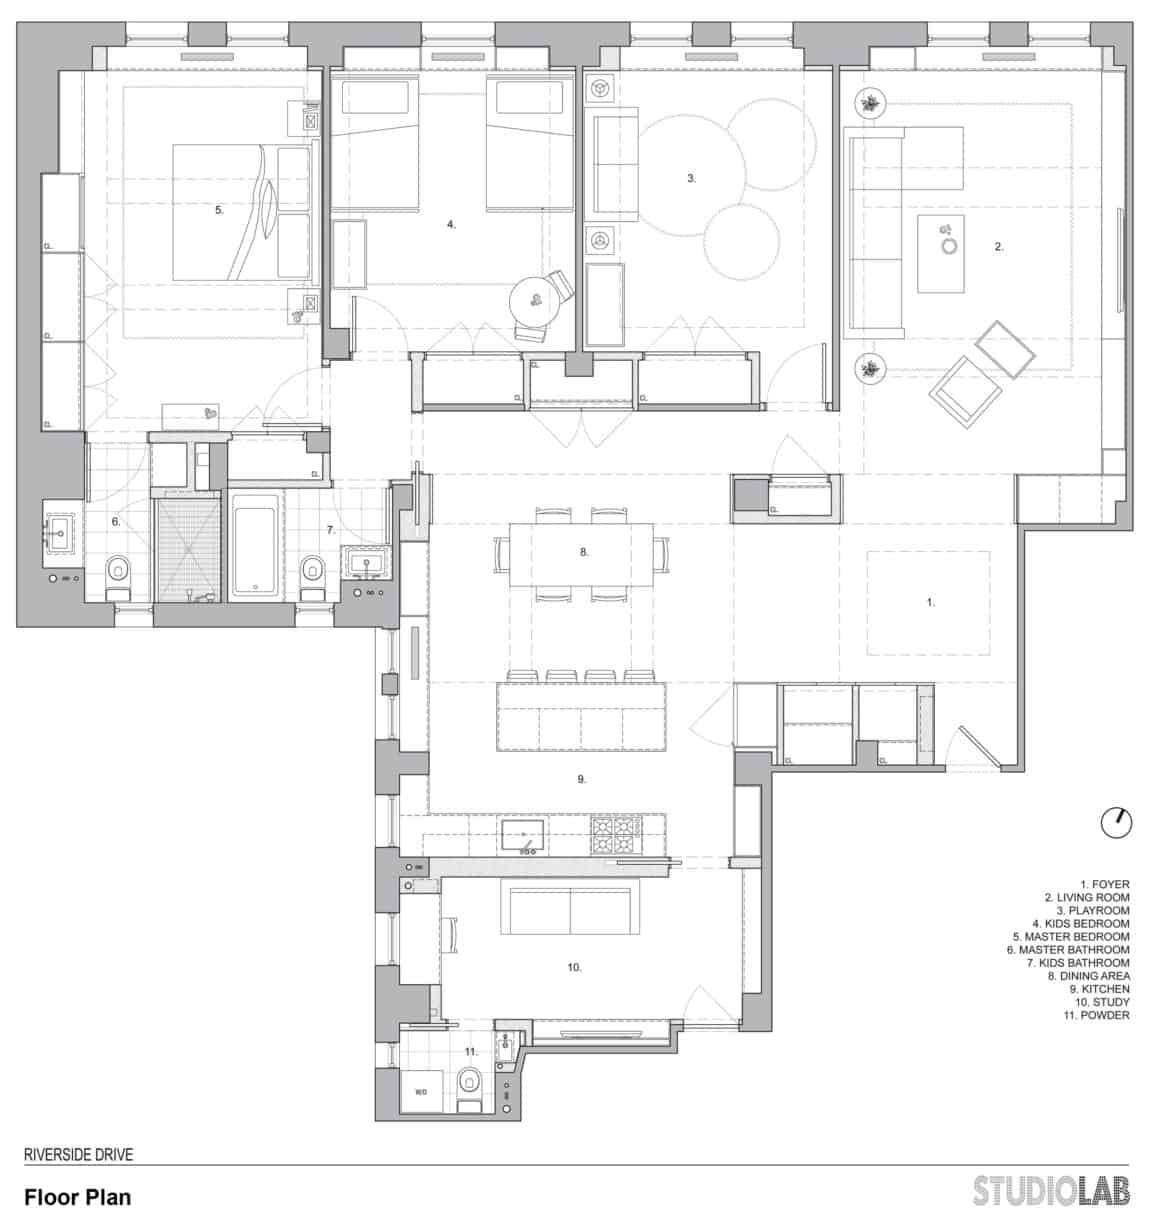 Riverside Drive Apartment by StudioLab (13)